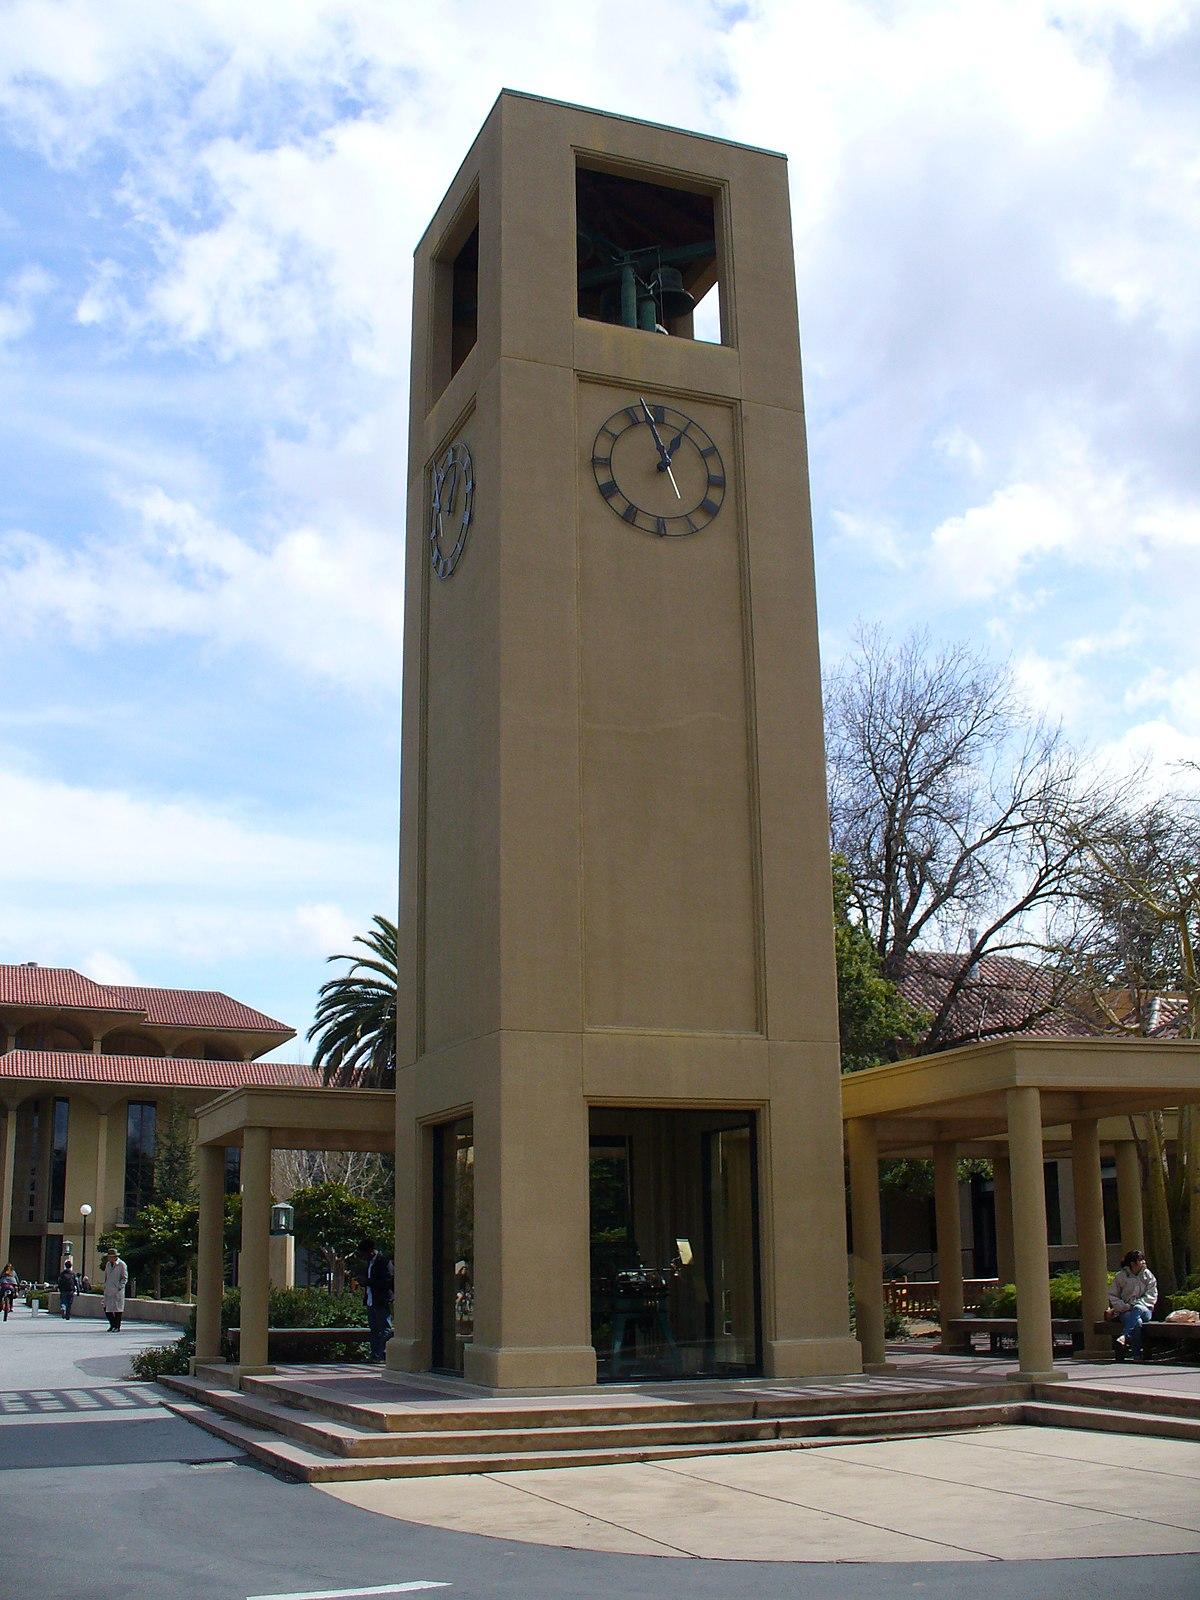 Stanford Clock Tower Wikipedia